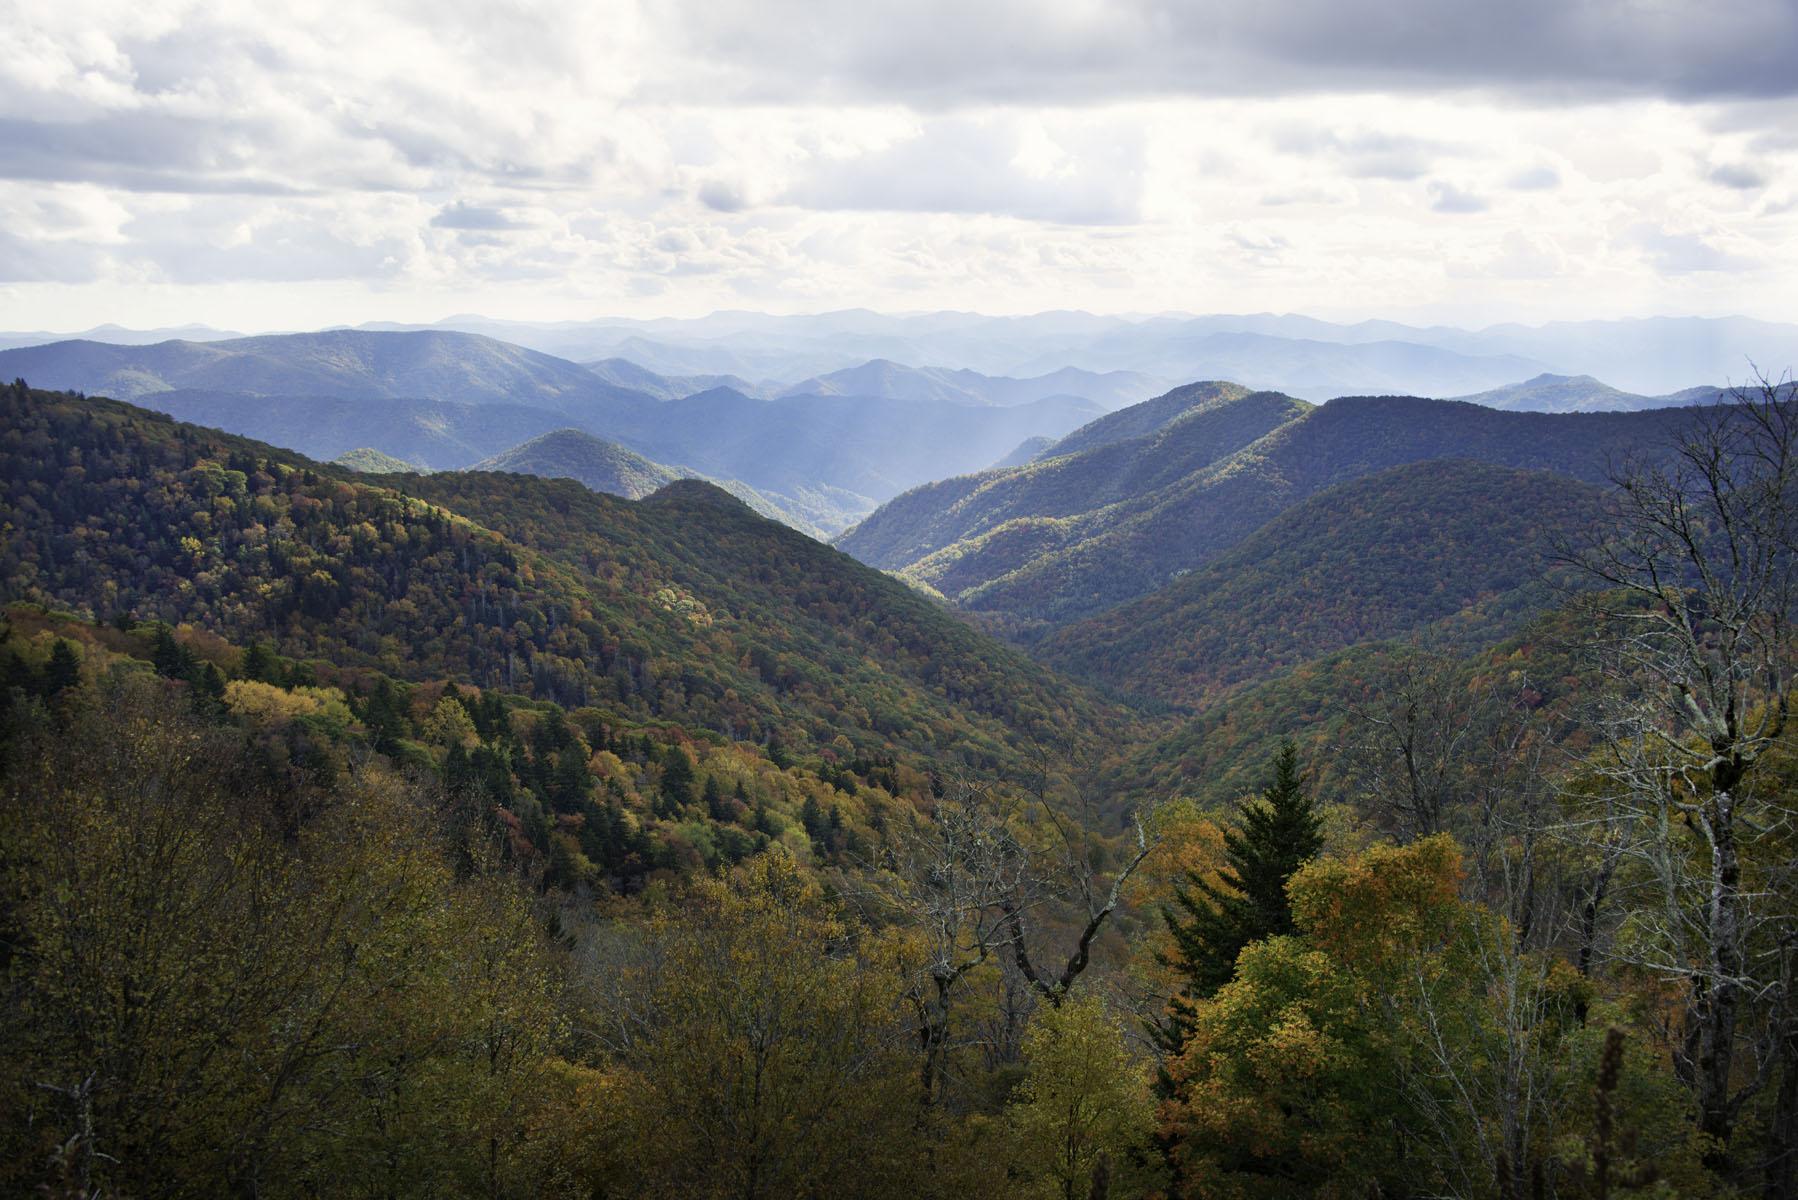 Smoky Mountain Landscape on Blue Ridge Parkway Near Asheville